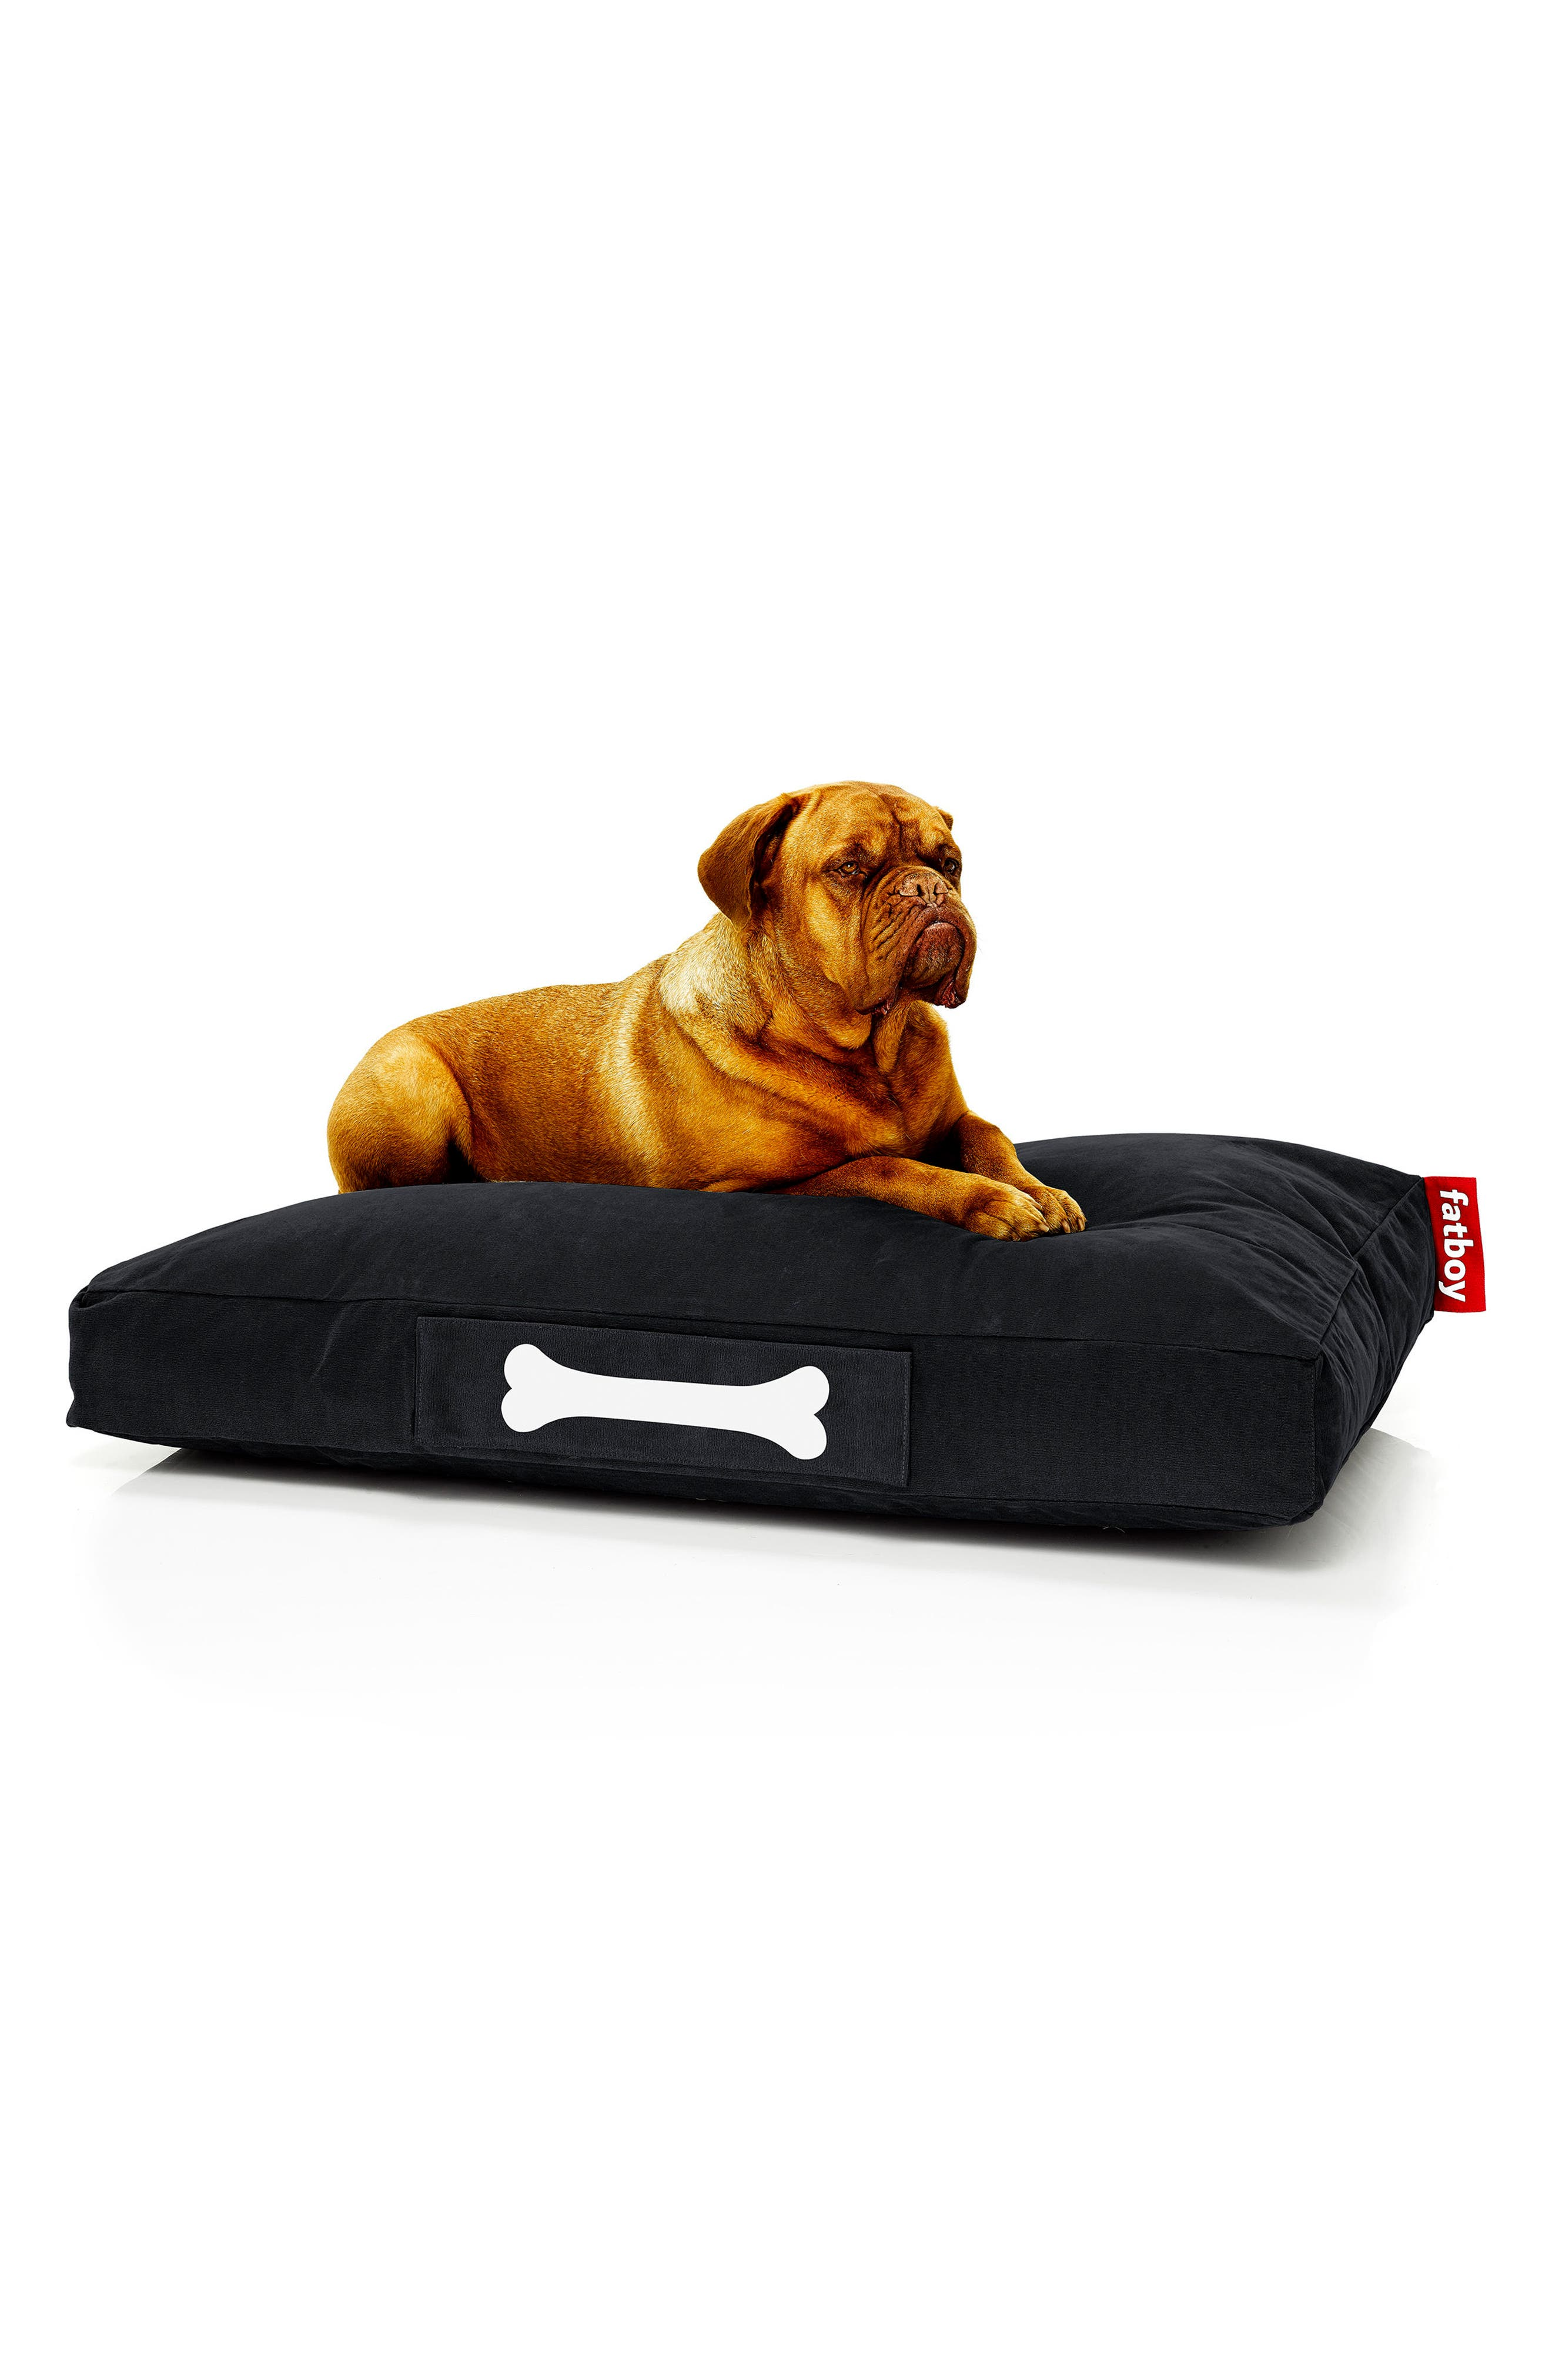 Doggielounge - Stonewashed Pet Bed,                             Alternate thumbnail 2, color,                             003